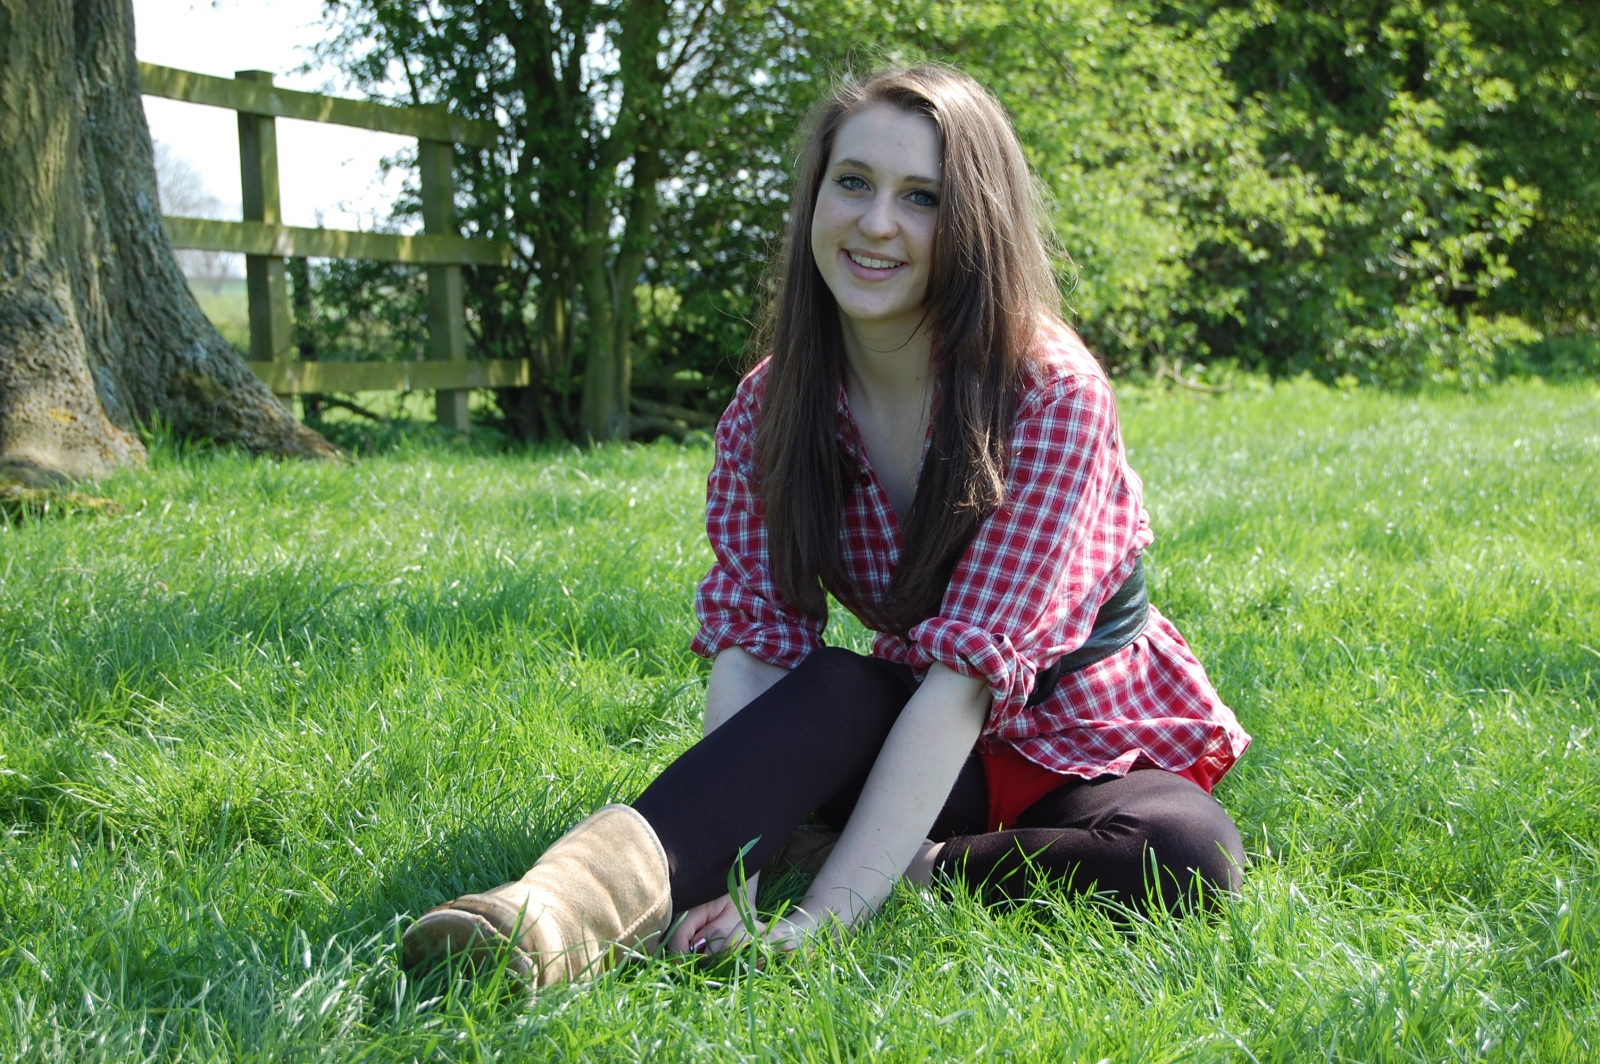 Alice Ruggles murder stalking